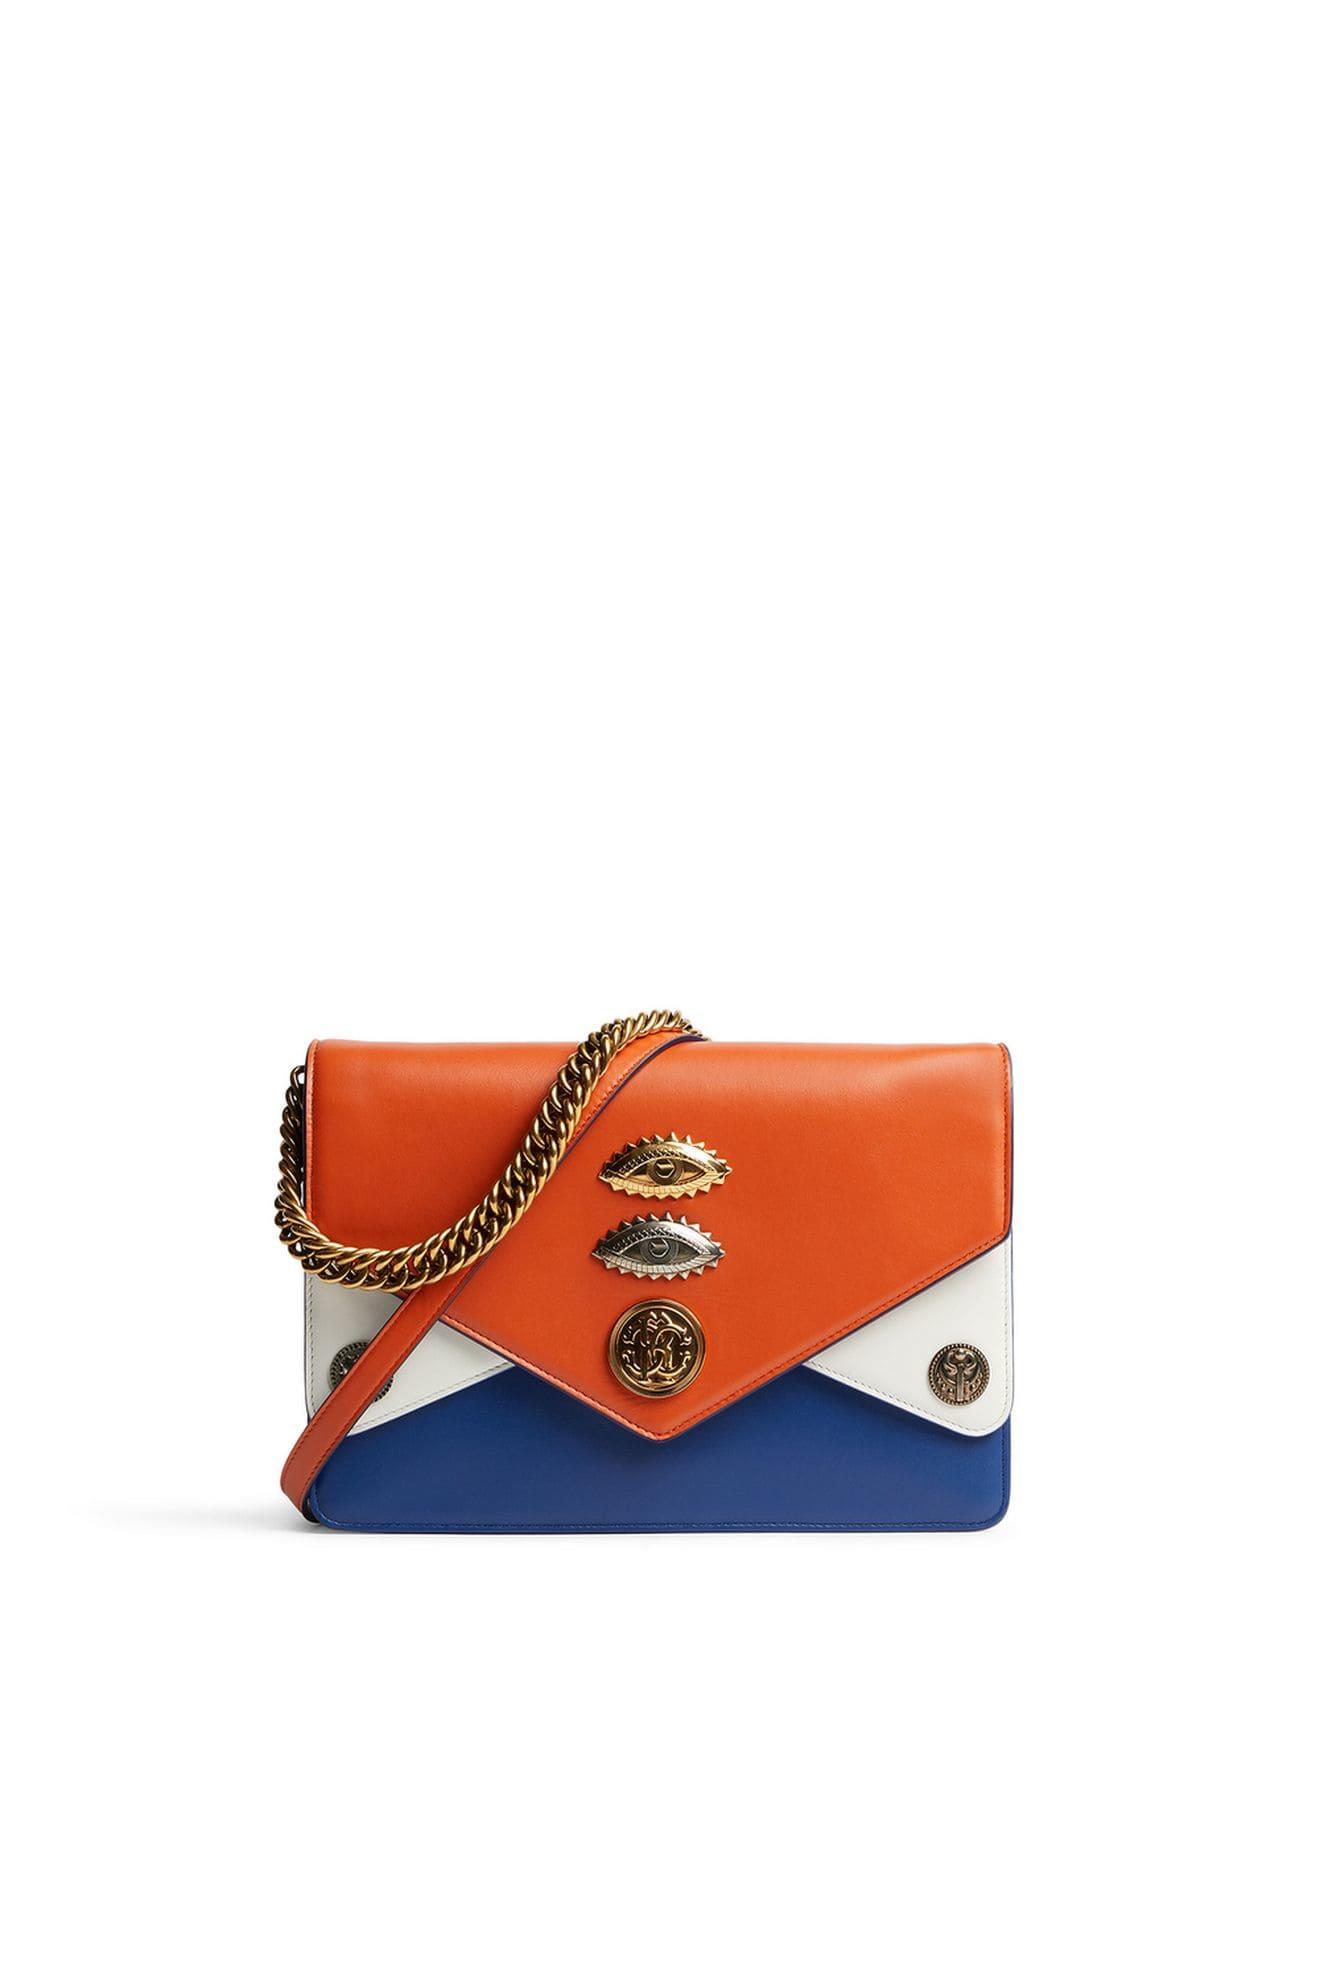 roberto-cavalli-medium-shoulder-bag-with-lucky-symbols_13151035_15413835_1320